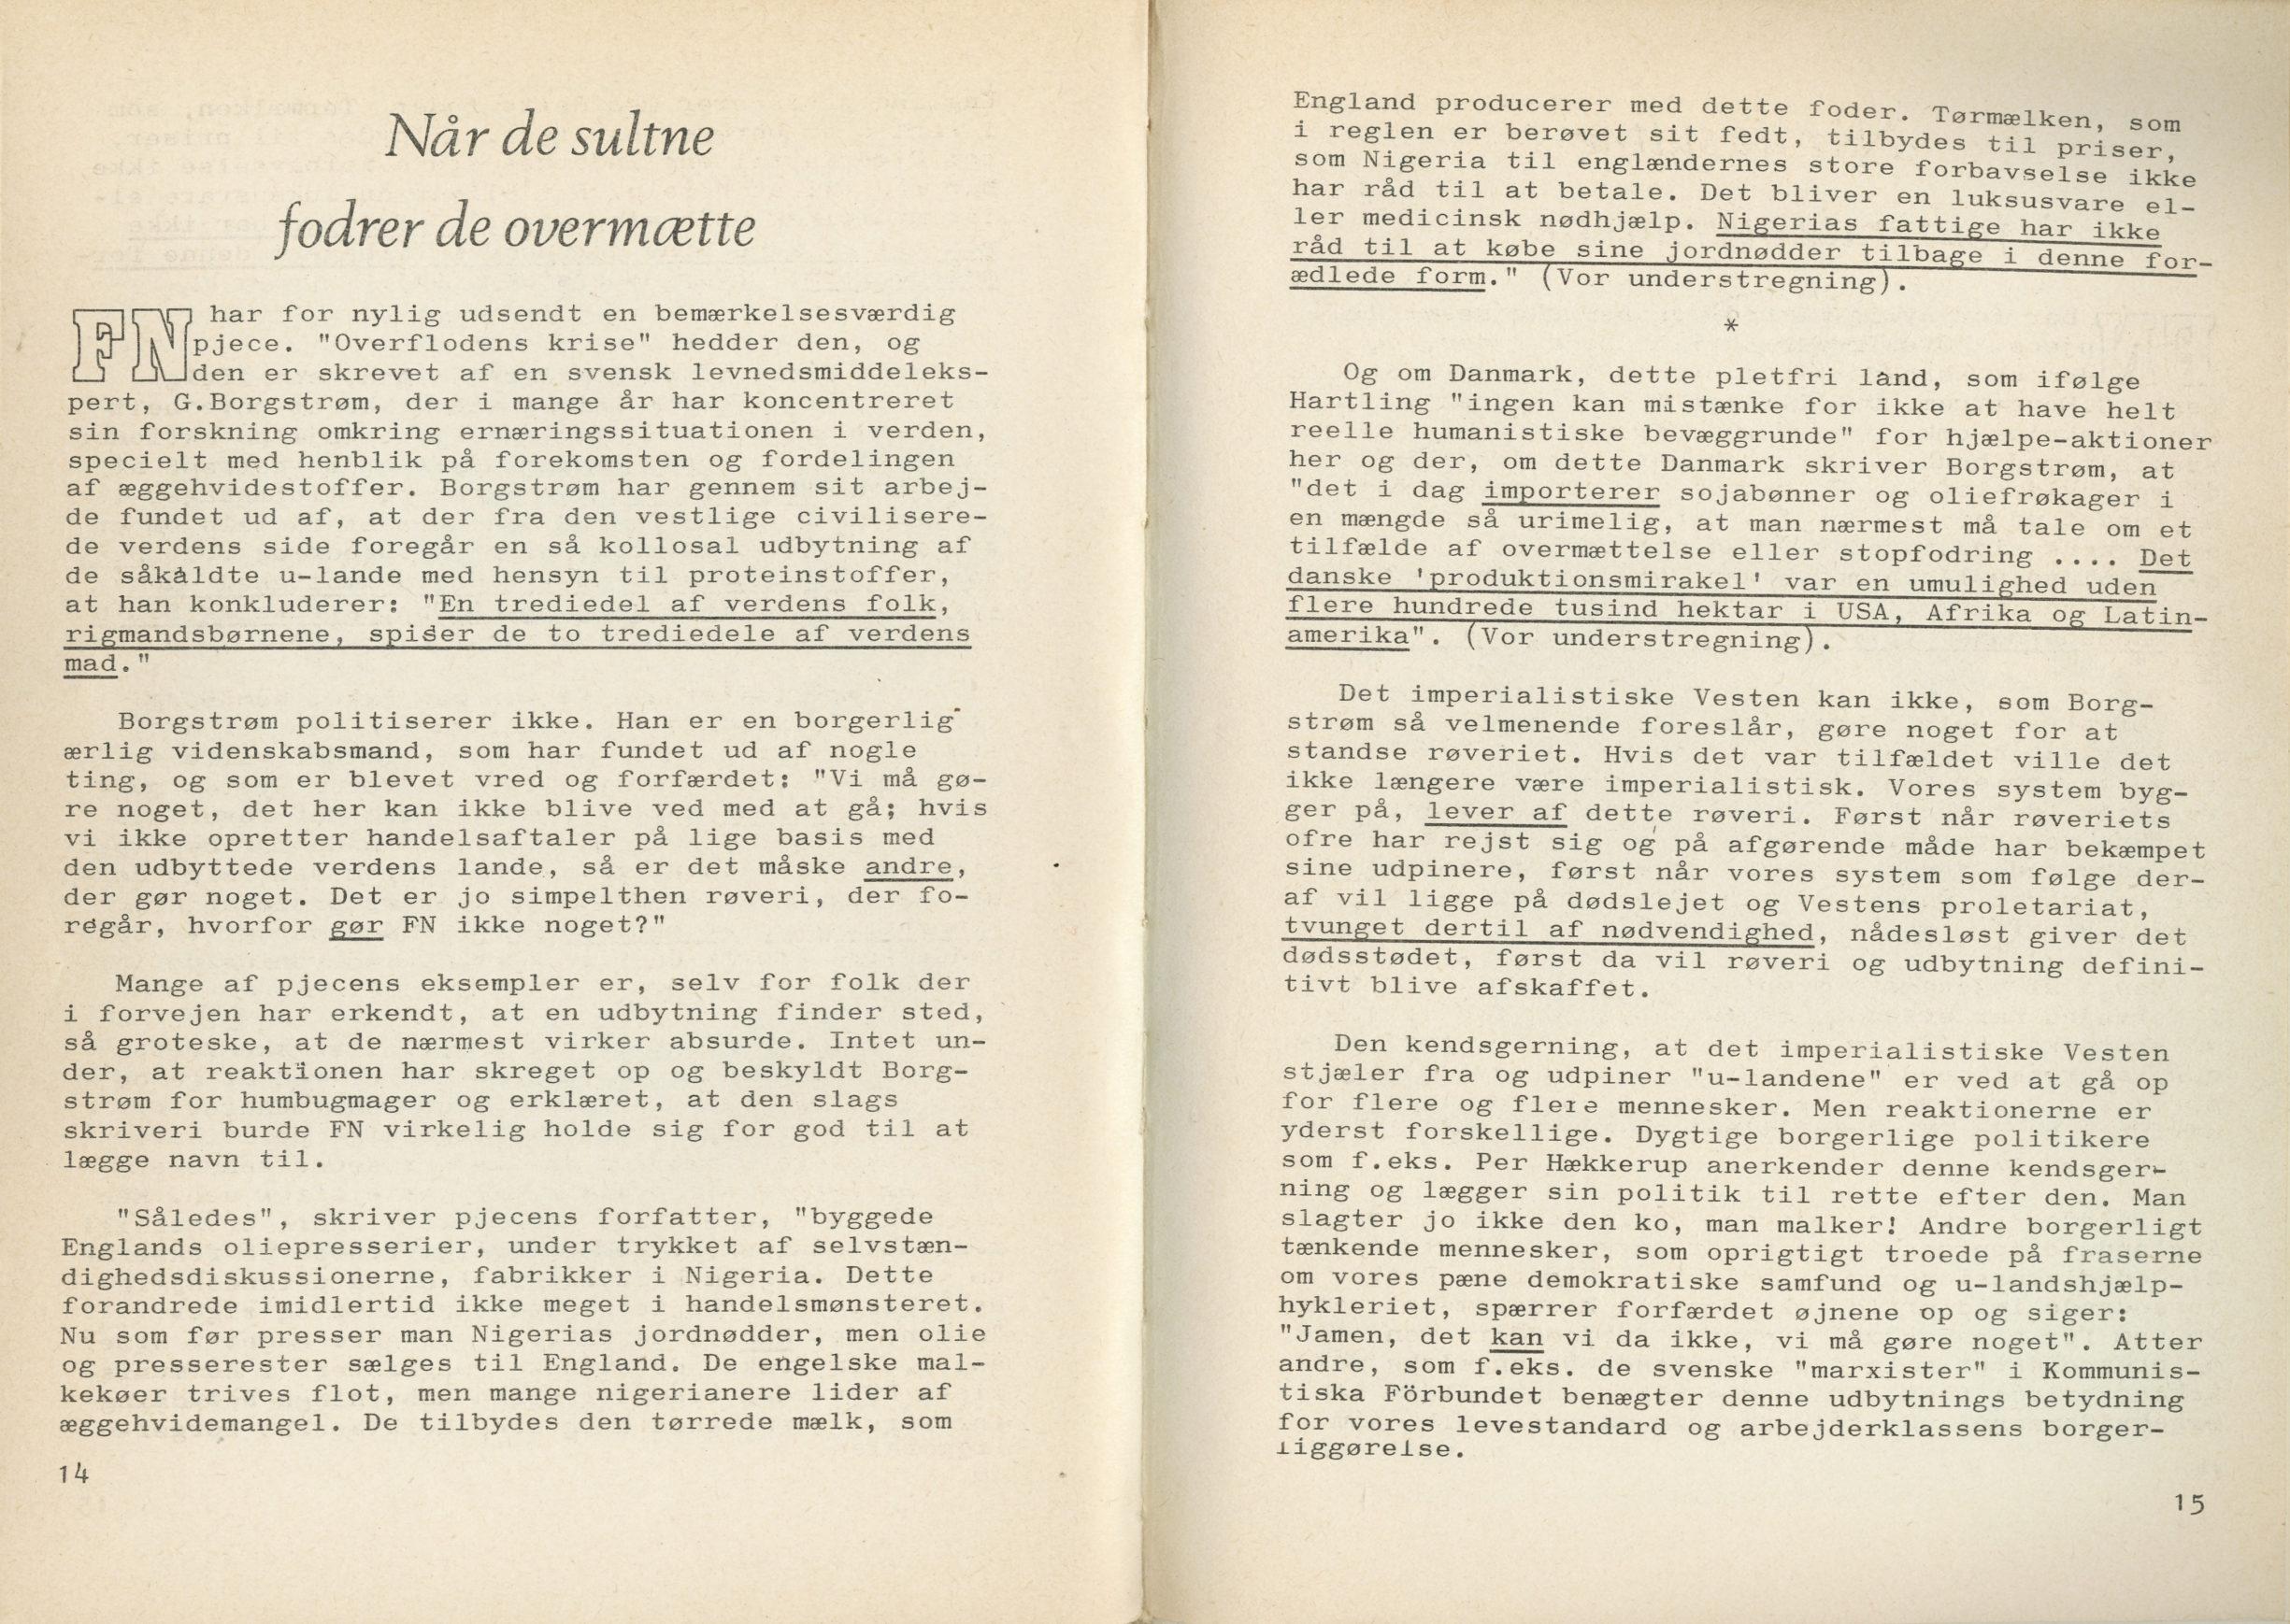 Ungkommunisten1968, nr. 10, s. 14-15.